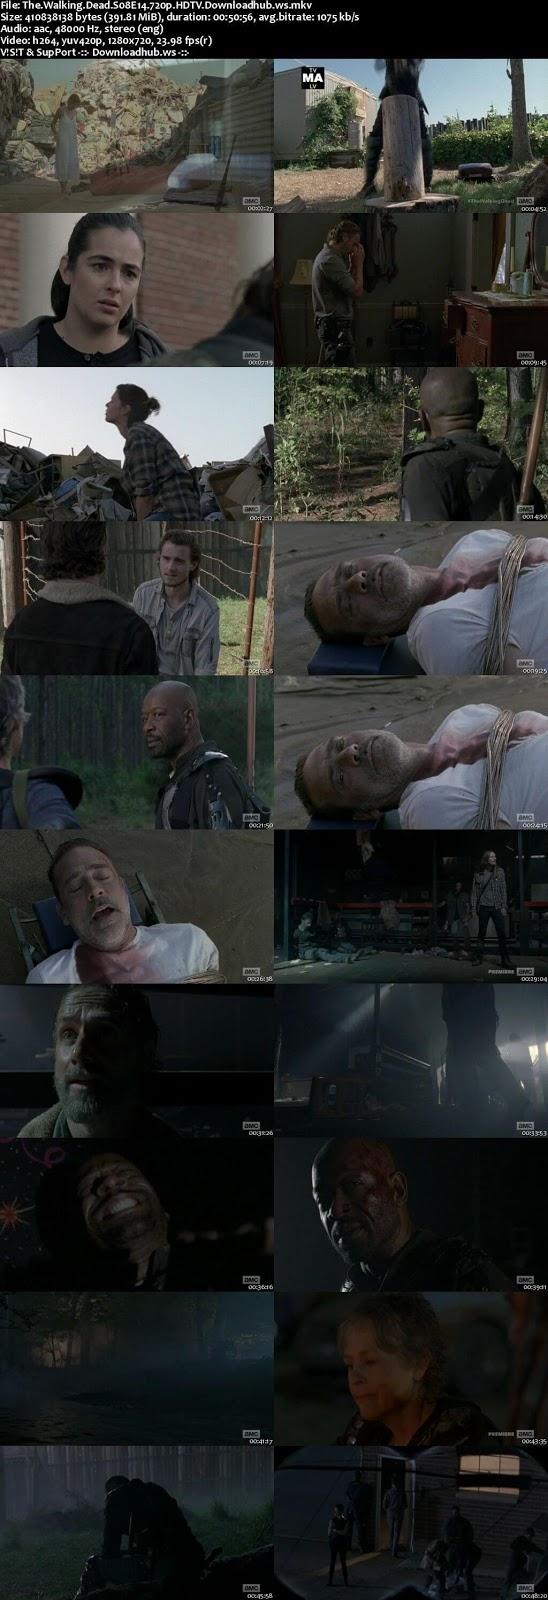 The Walking Dead S08E14 390MB HDTV 720p x264